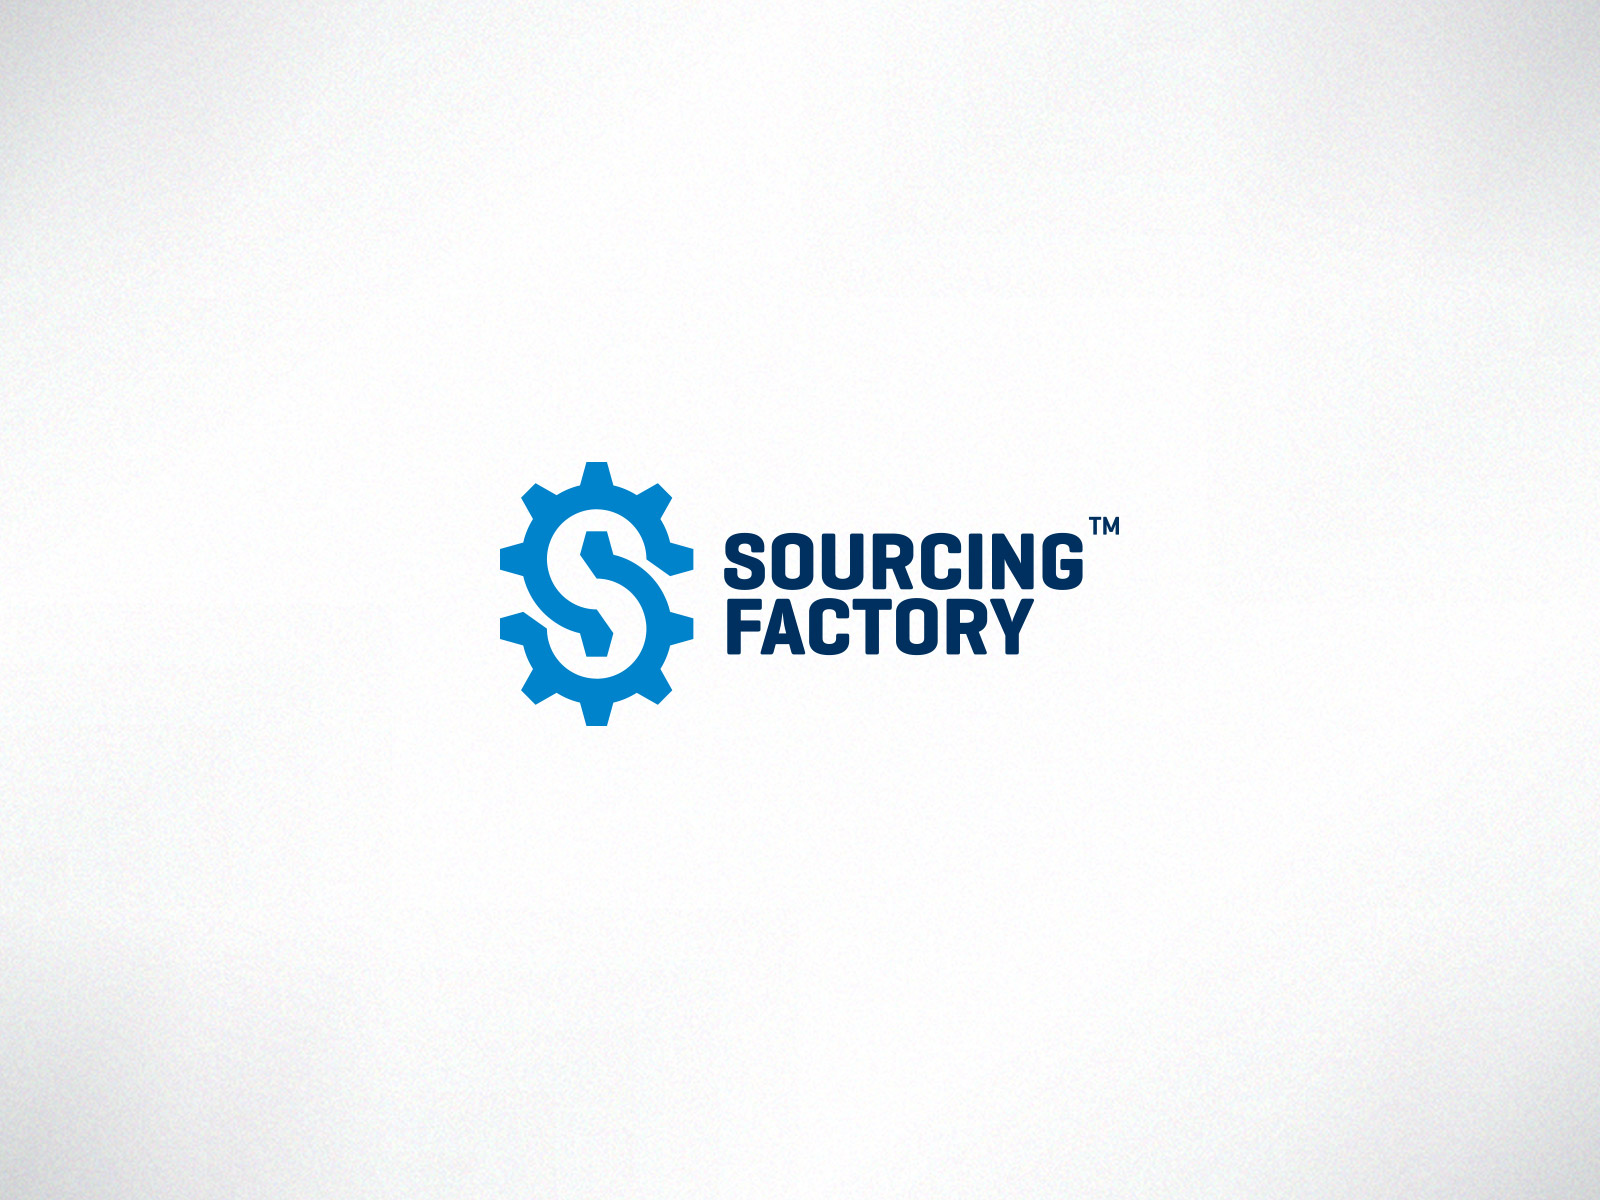 Sourcing factory logo design flat colors